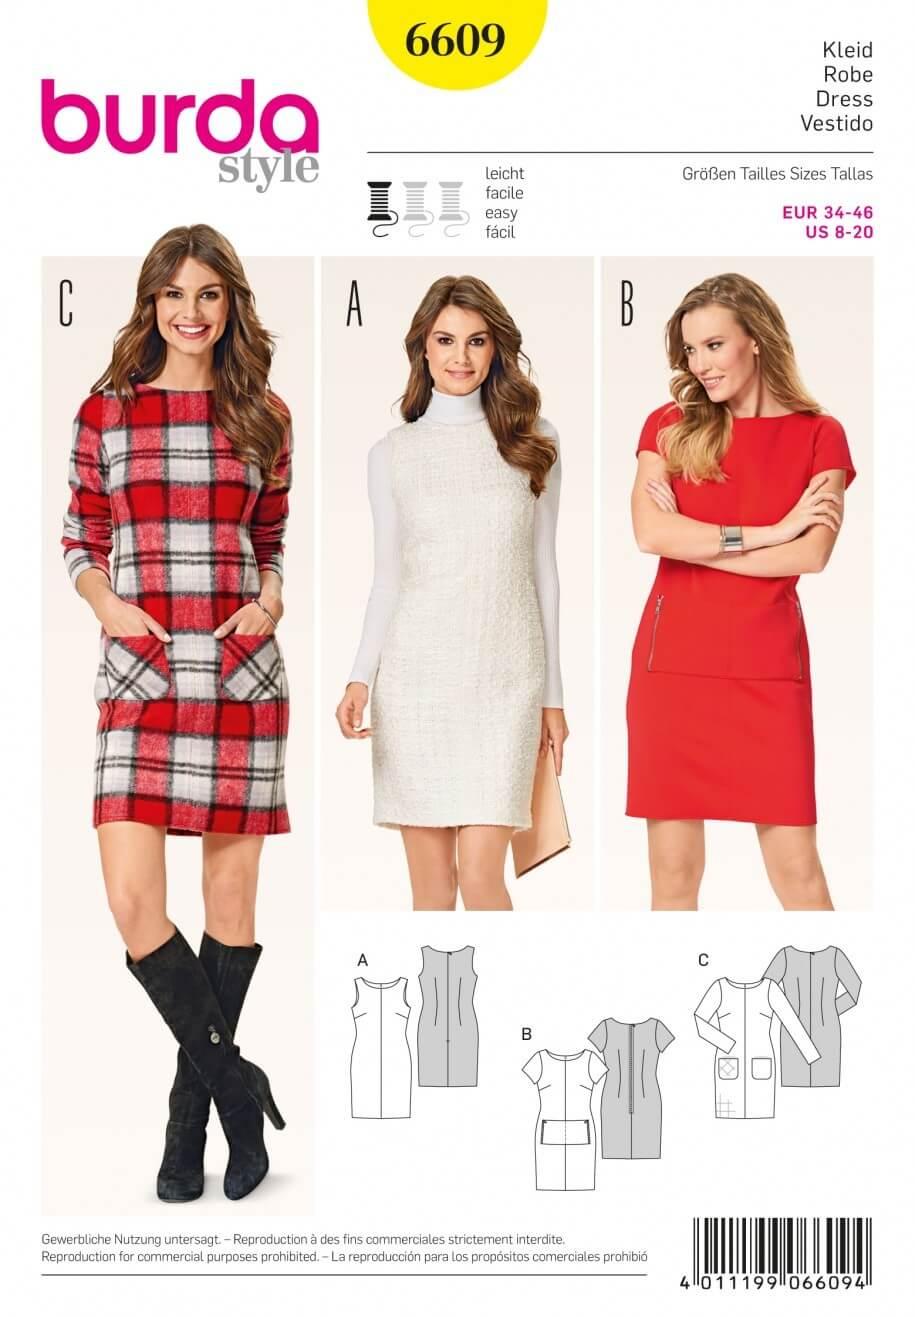 Burda Style Shift Dress Shallow Neckline Evening Wear Sewing Pattern 6609